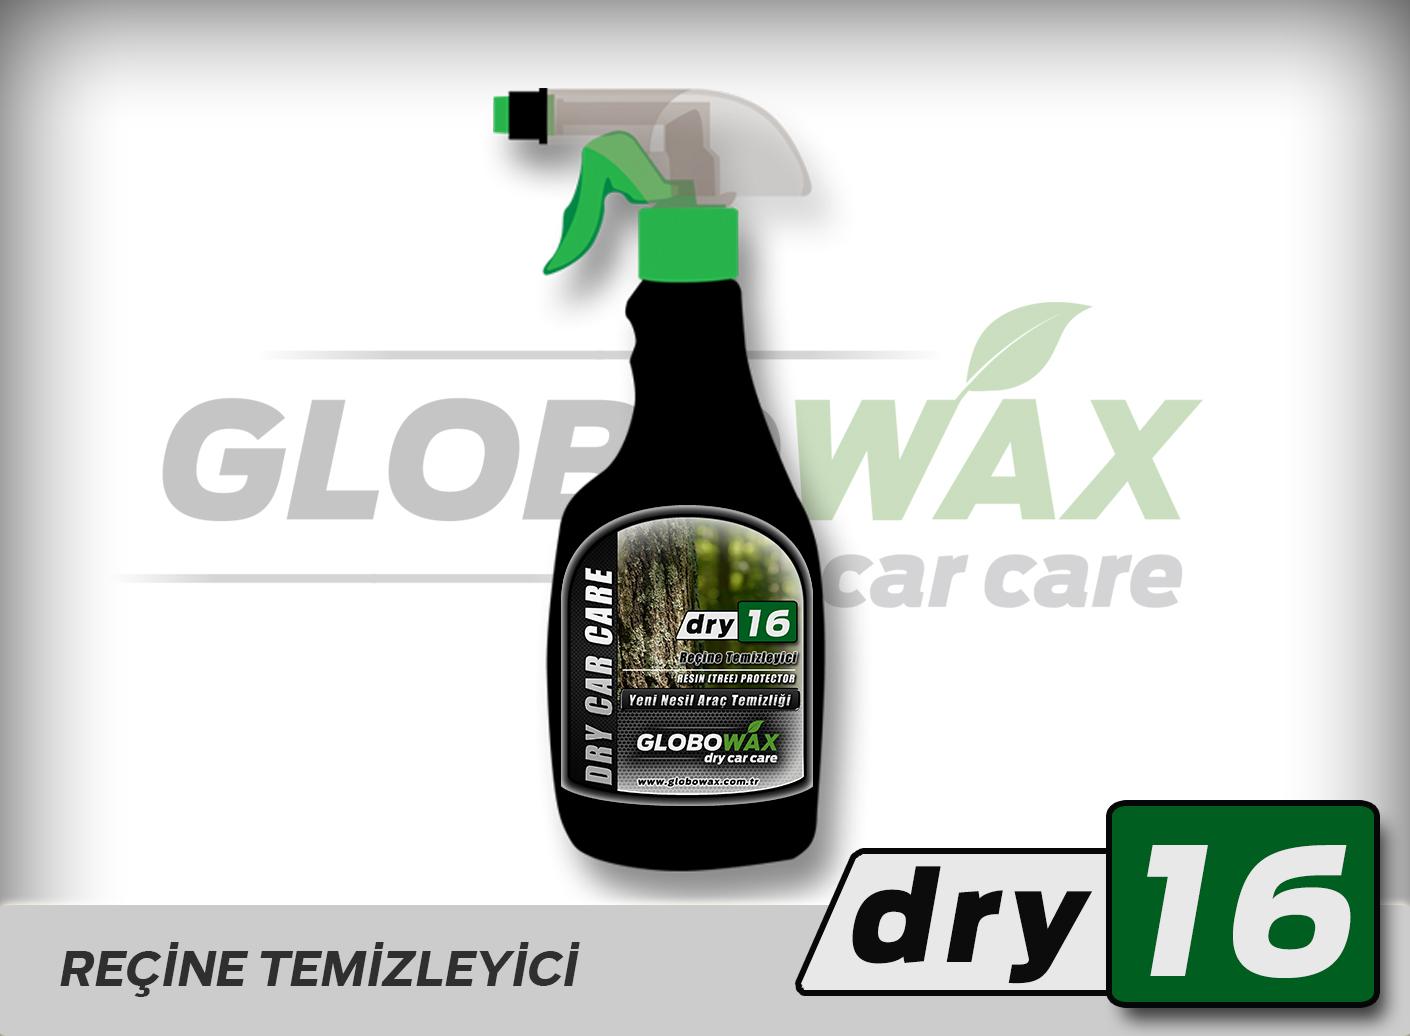 GLOBOWAX-SISE-16-16-16